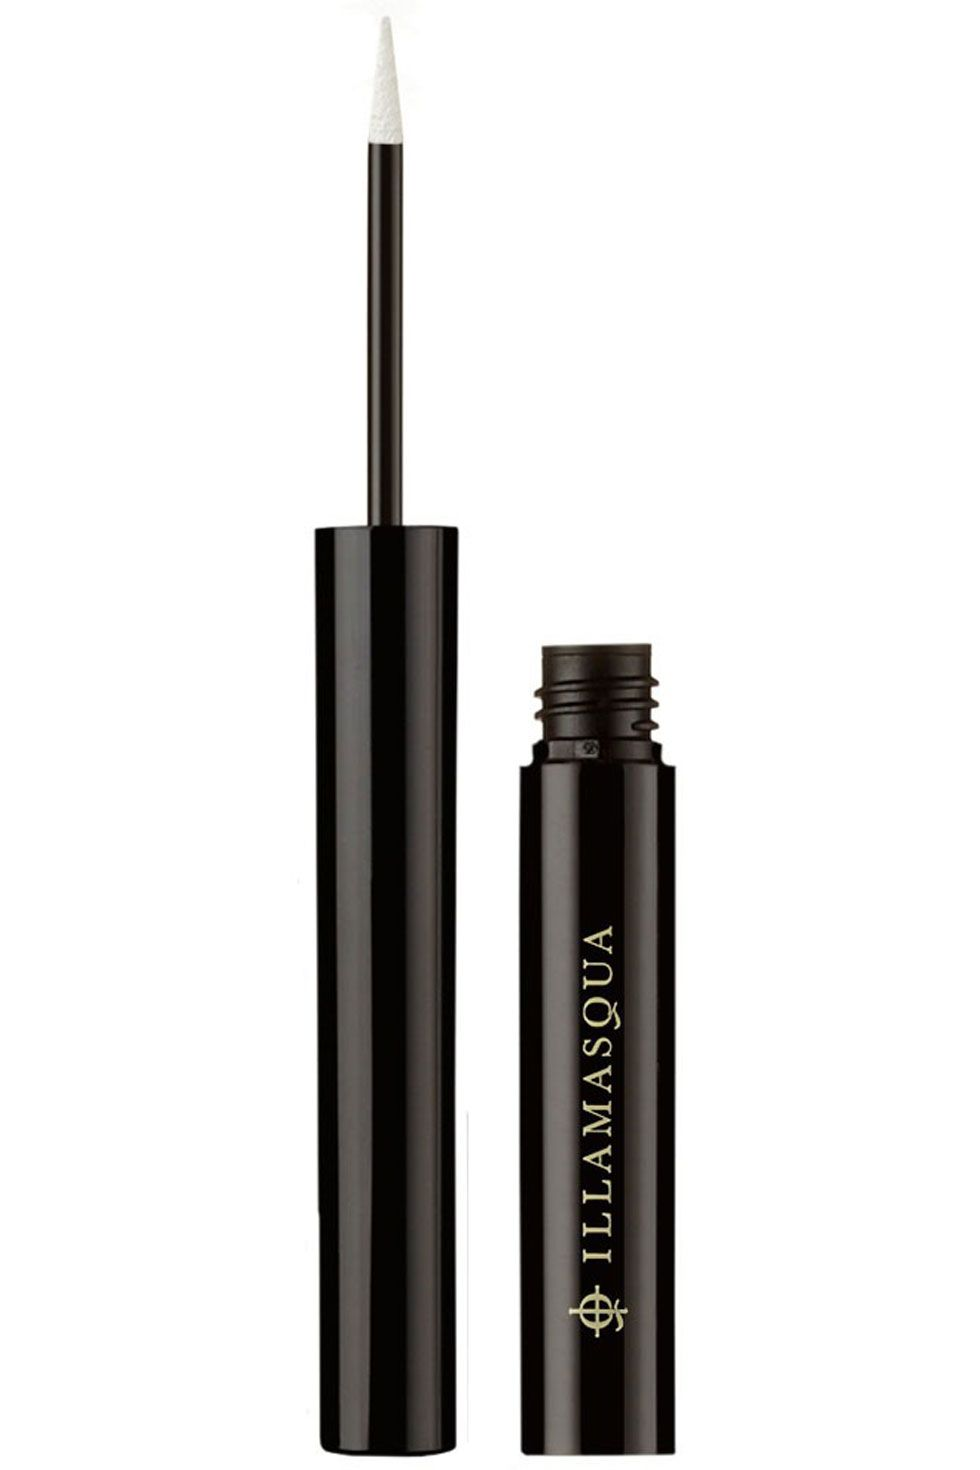 "Illamasqua Precision Ink in Scribe Pure White, $28&#x3B; <a target=""_blank"" href=""http://www.illamasqua.com/shop/eyes/eye-liners/scribe-precision-ink/"">illamasqua.com</a>"